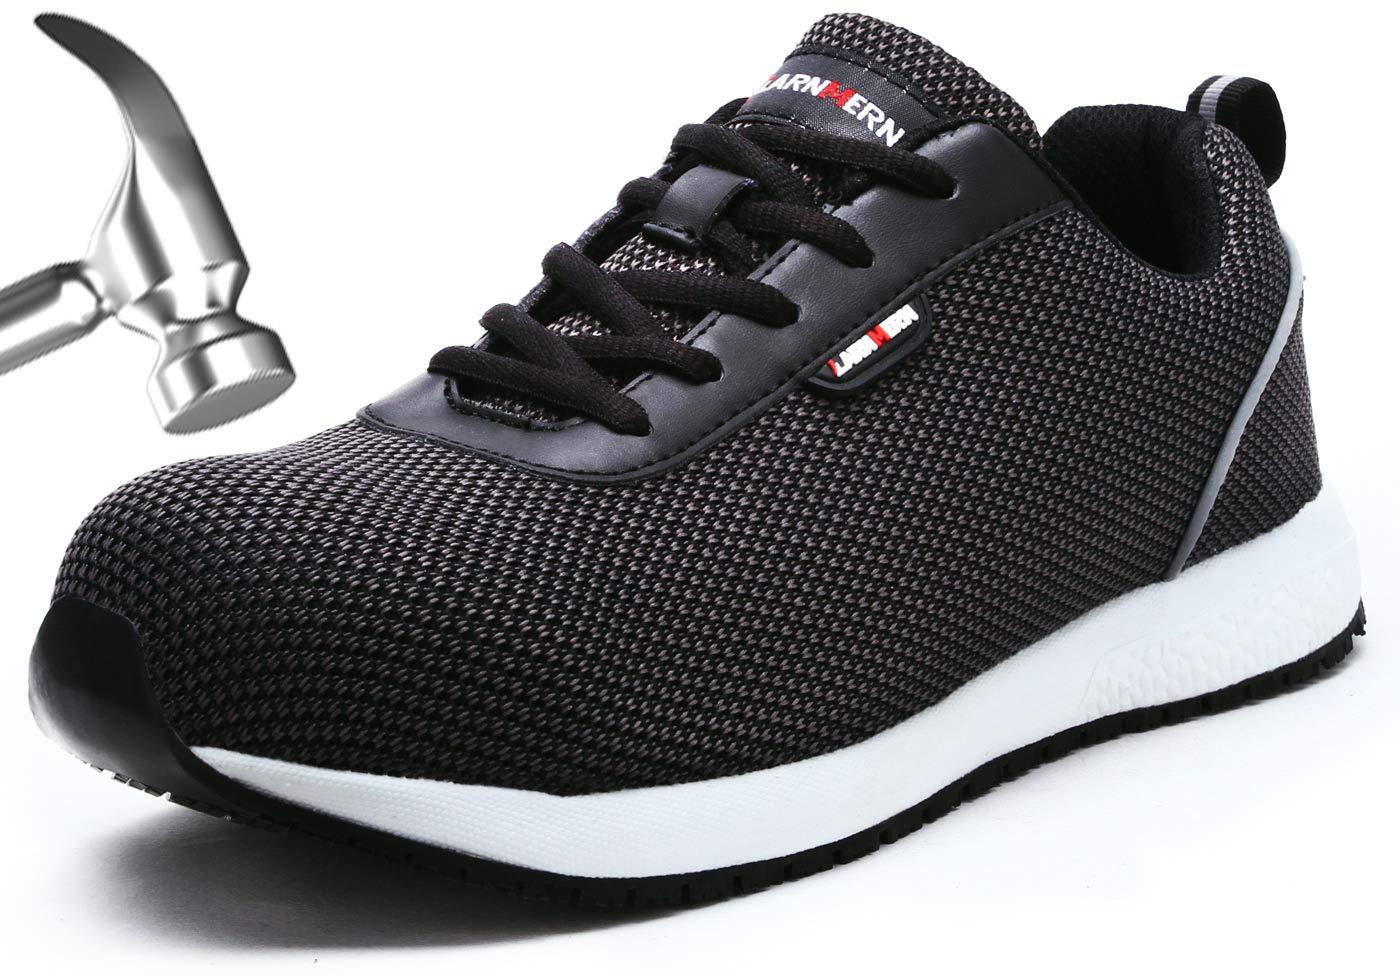 LARNMERN Steel Toe Shoes Men, Work Safety Reflective Strip SRA Industrial & Construction Shoe, LM1027 (11, Black Knit S1)